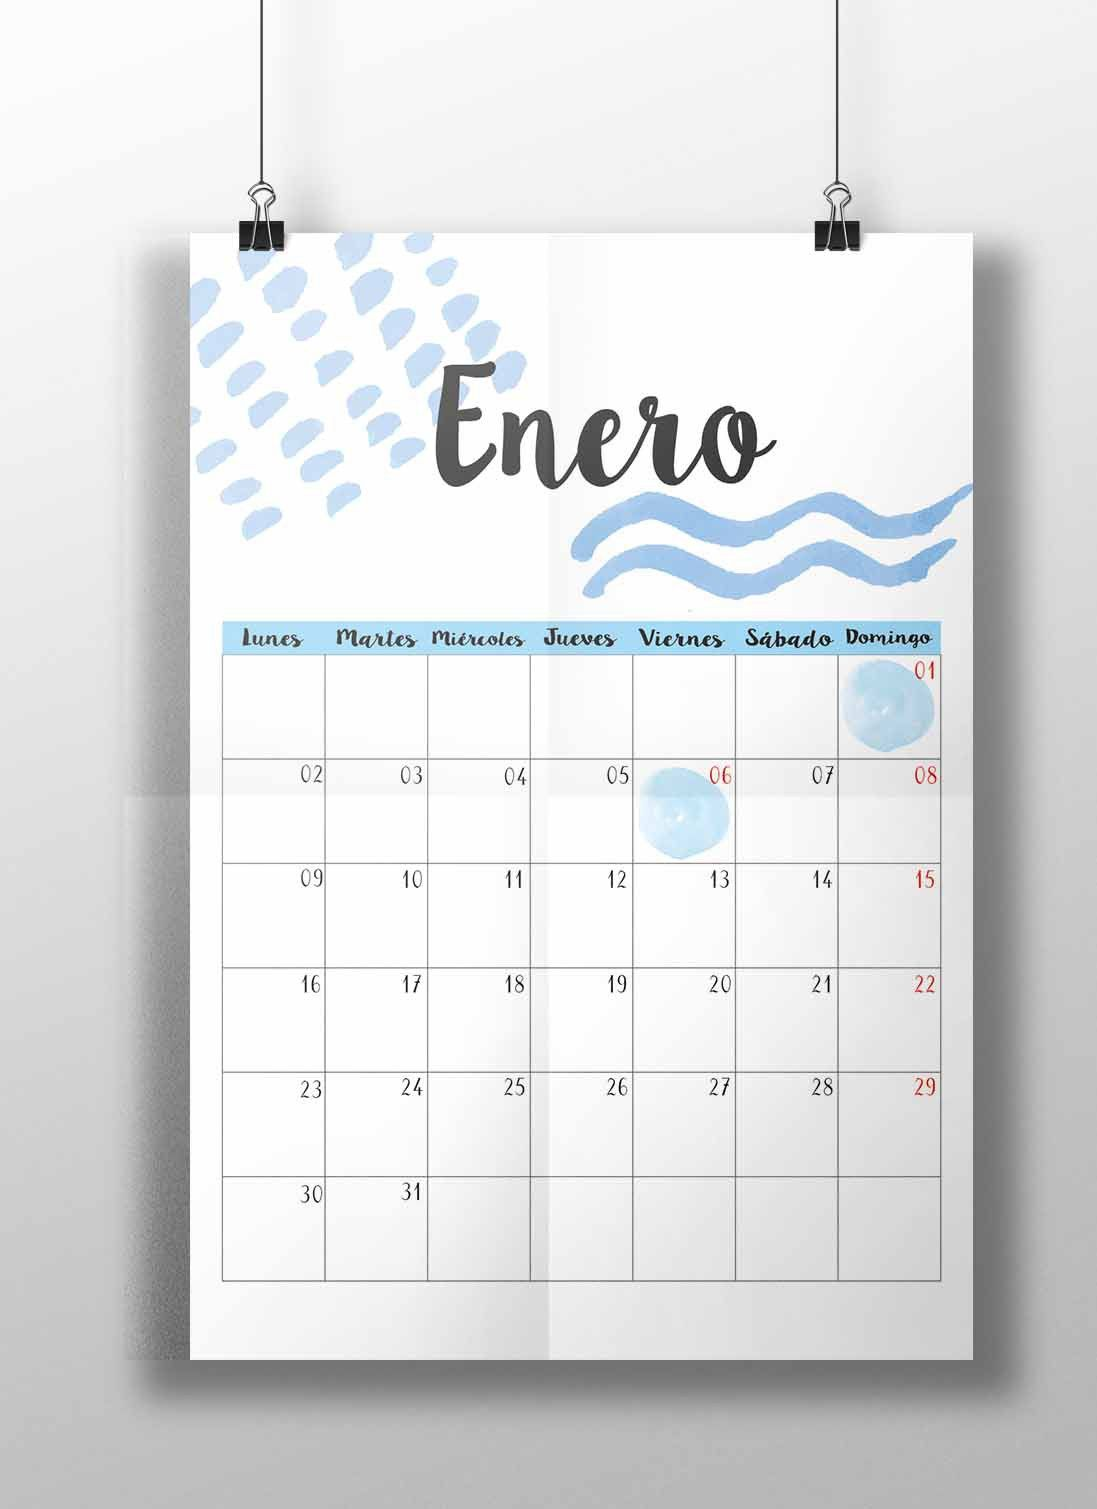 Imprimible calendario 2017 calendario 2017 pinterest - Agenda imprimible 2017 ...